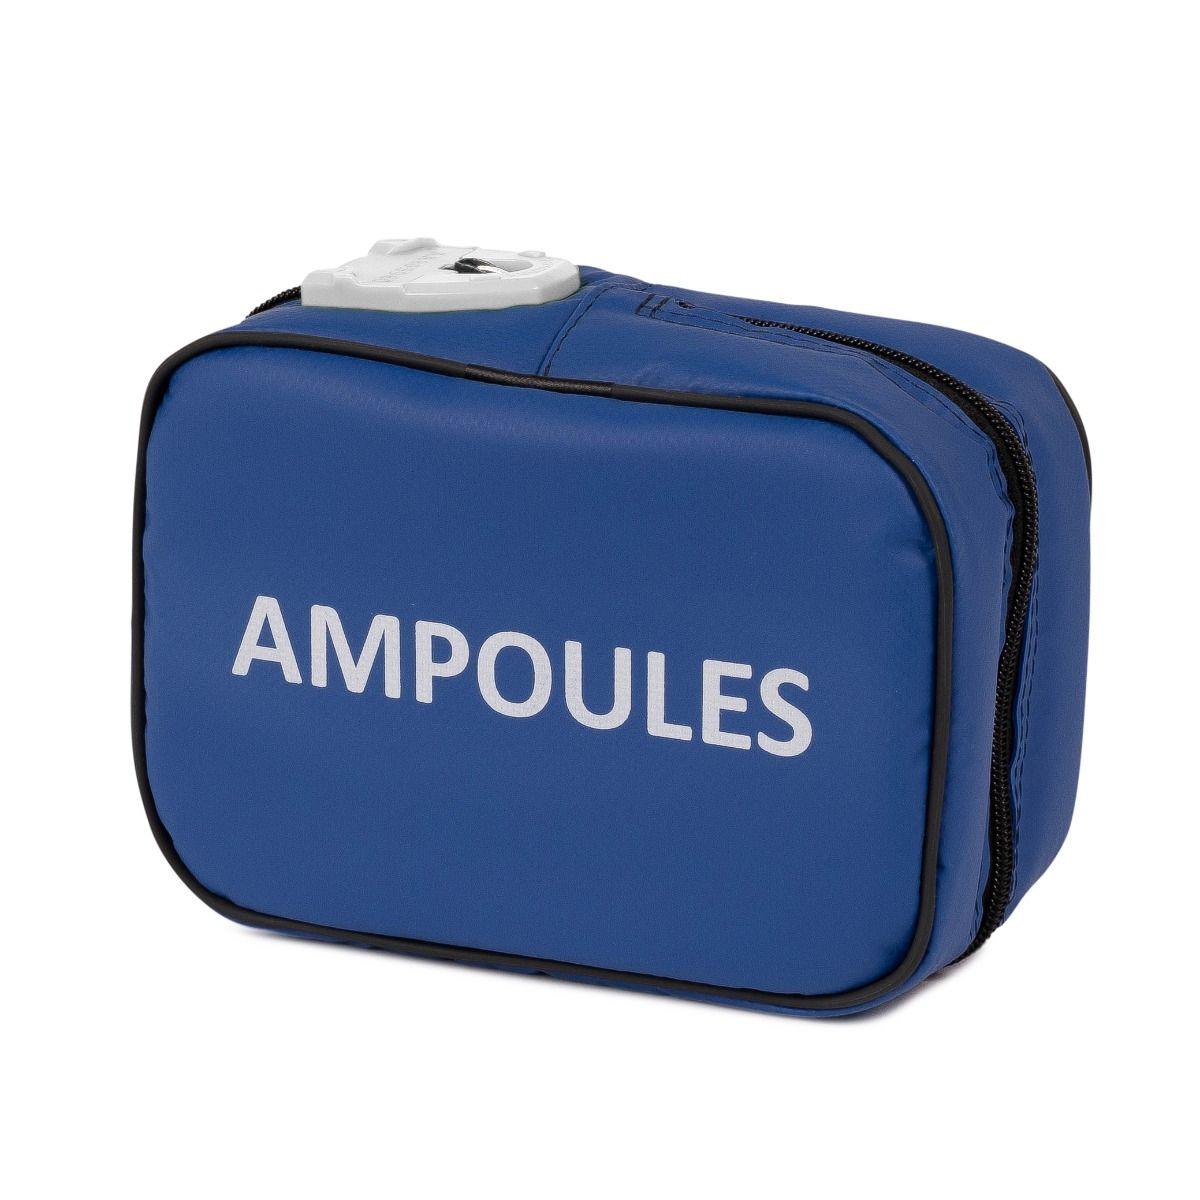 Ampoules Test Tube Pouch